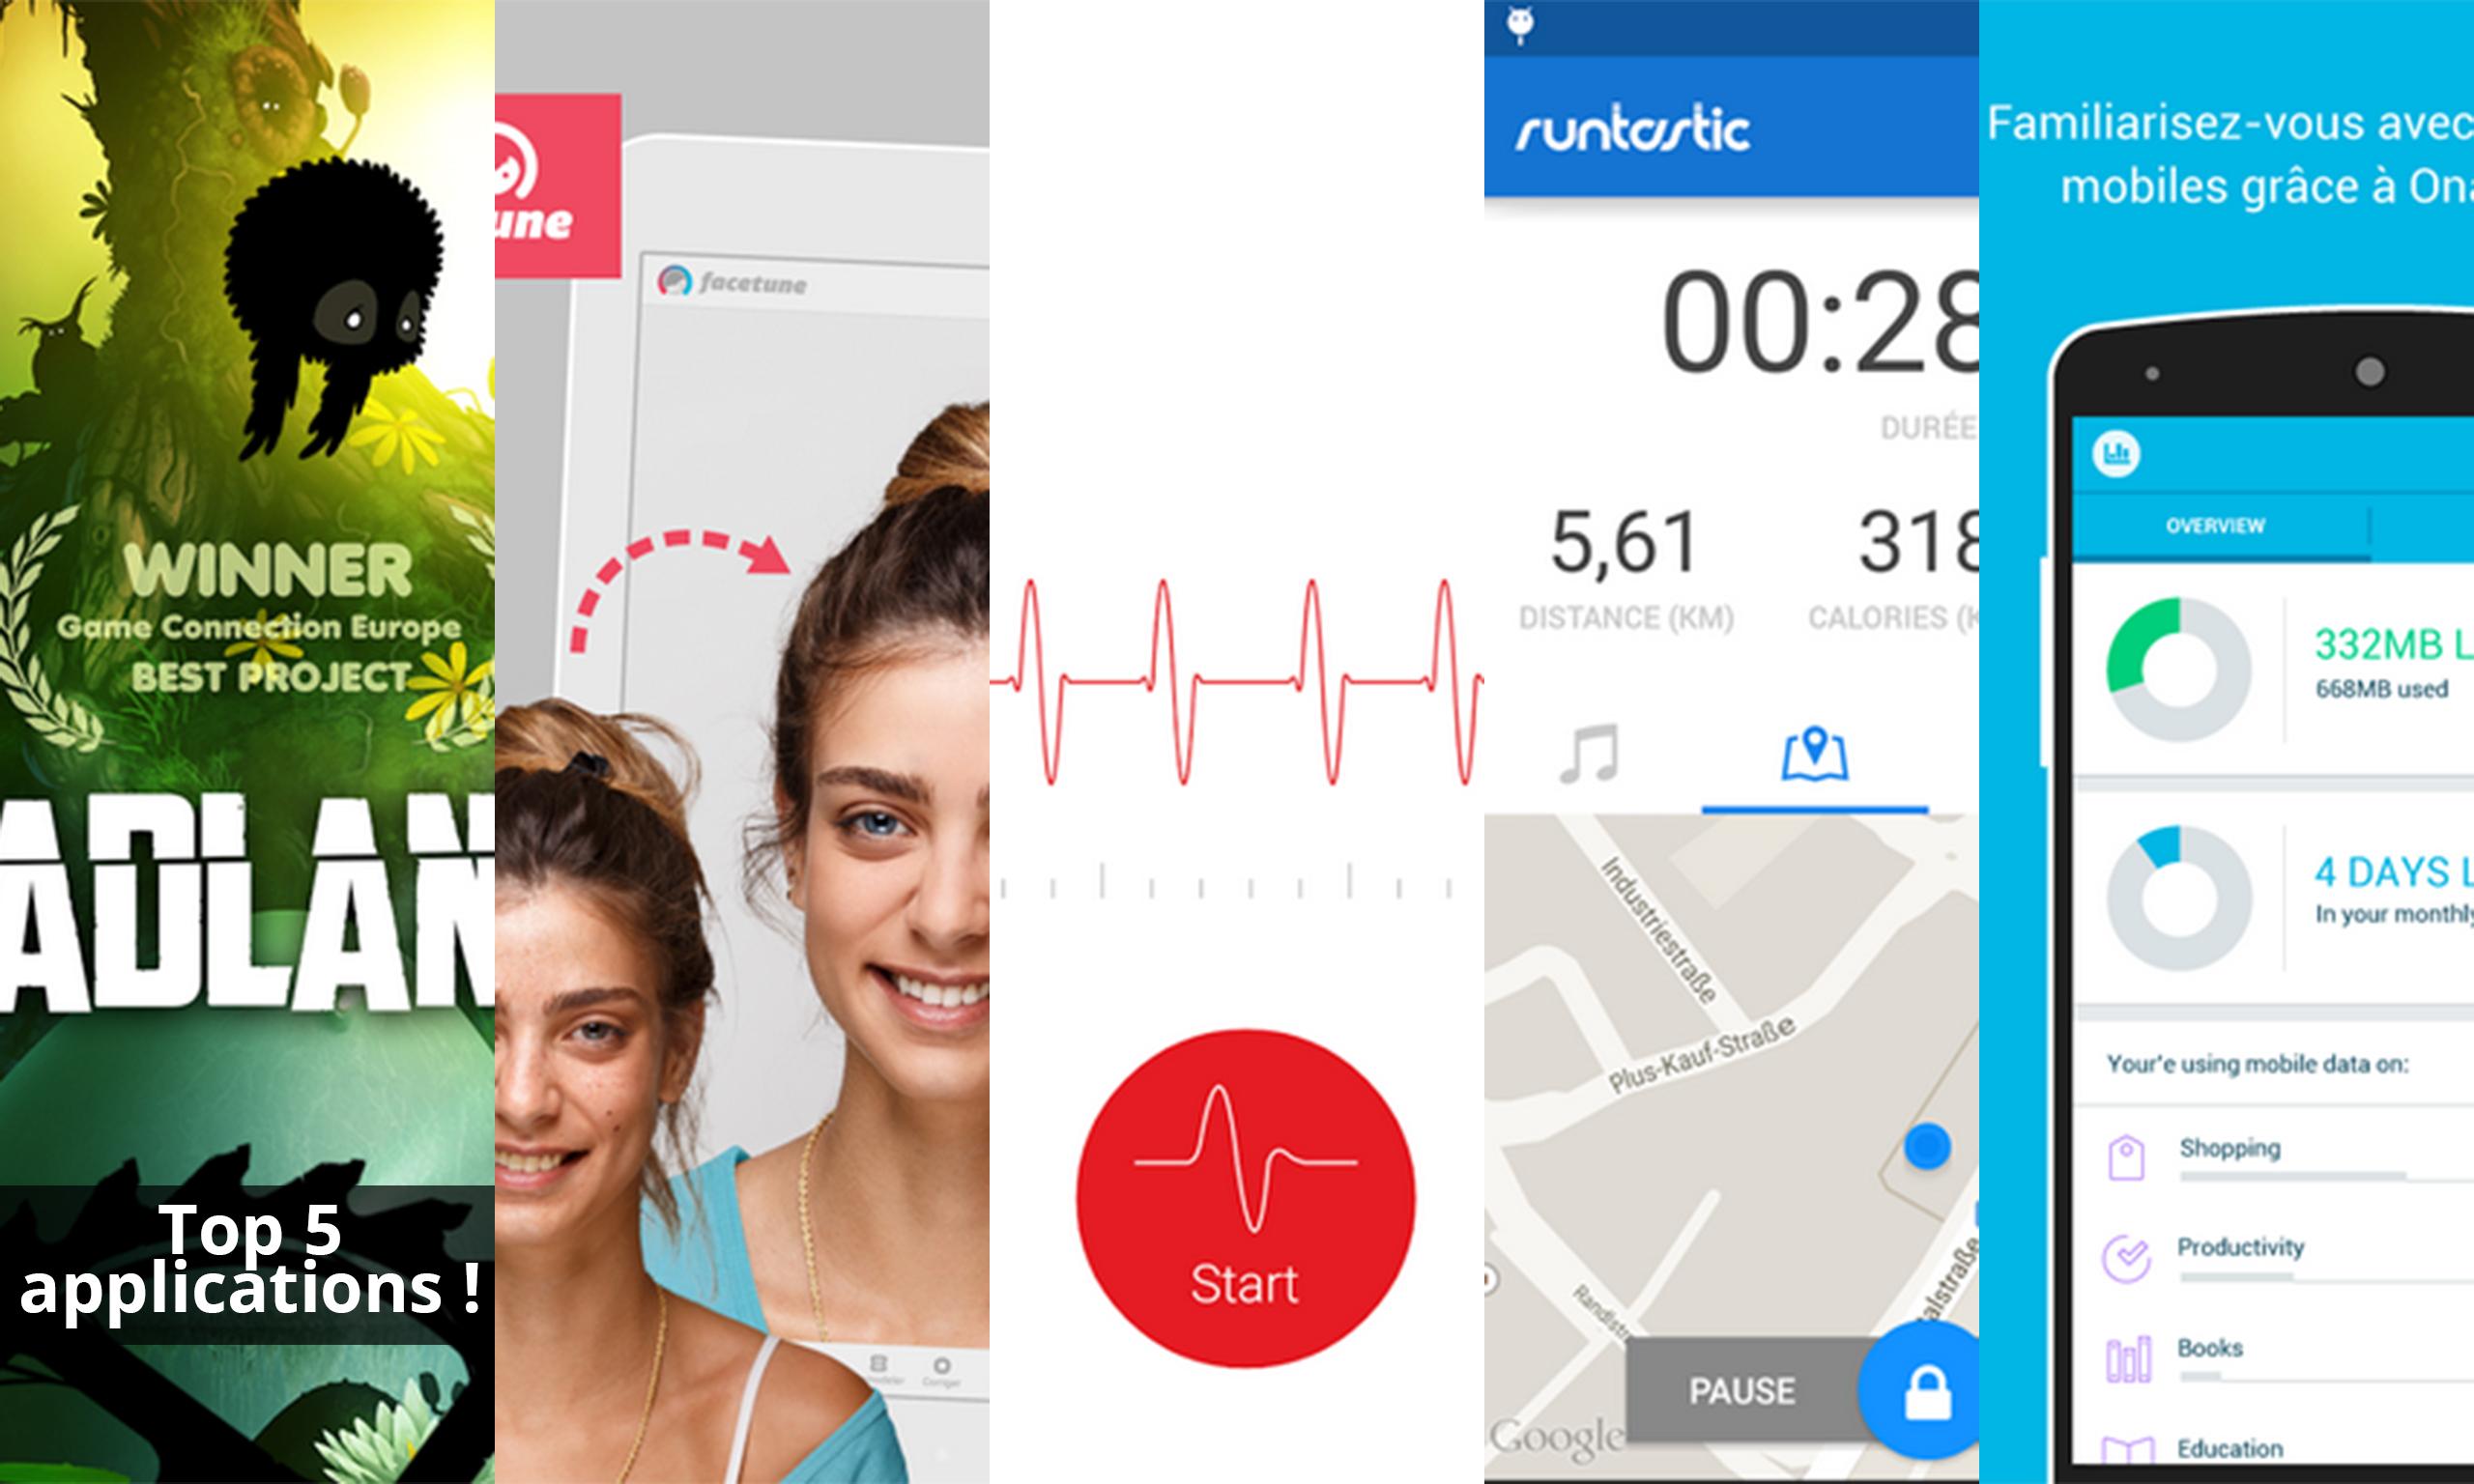 Les apps de la semaine : BADLAND, Facetune, Cardiographe, Runtastic et Onavo Count